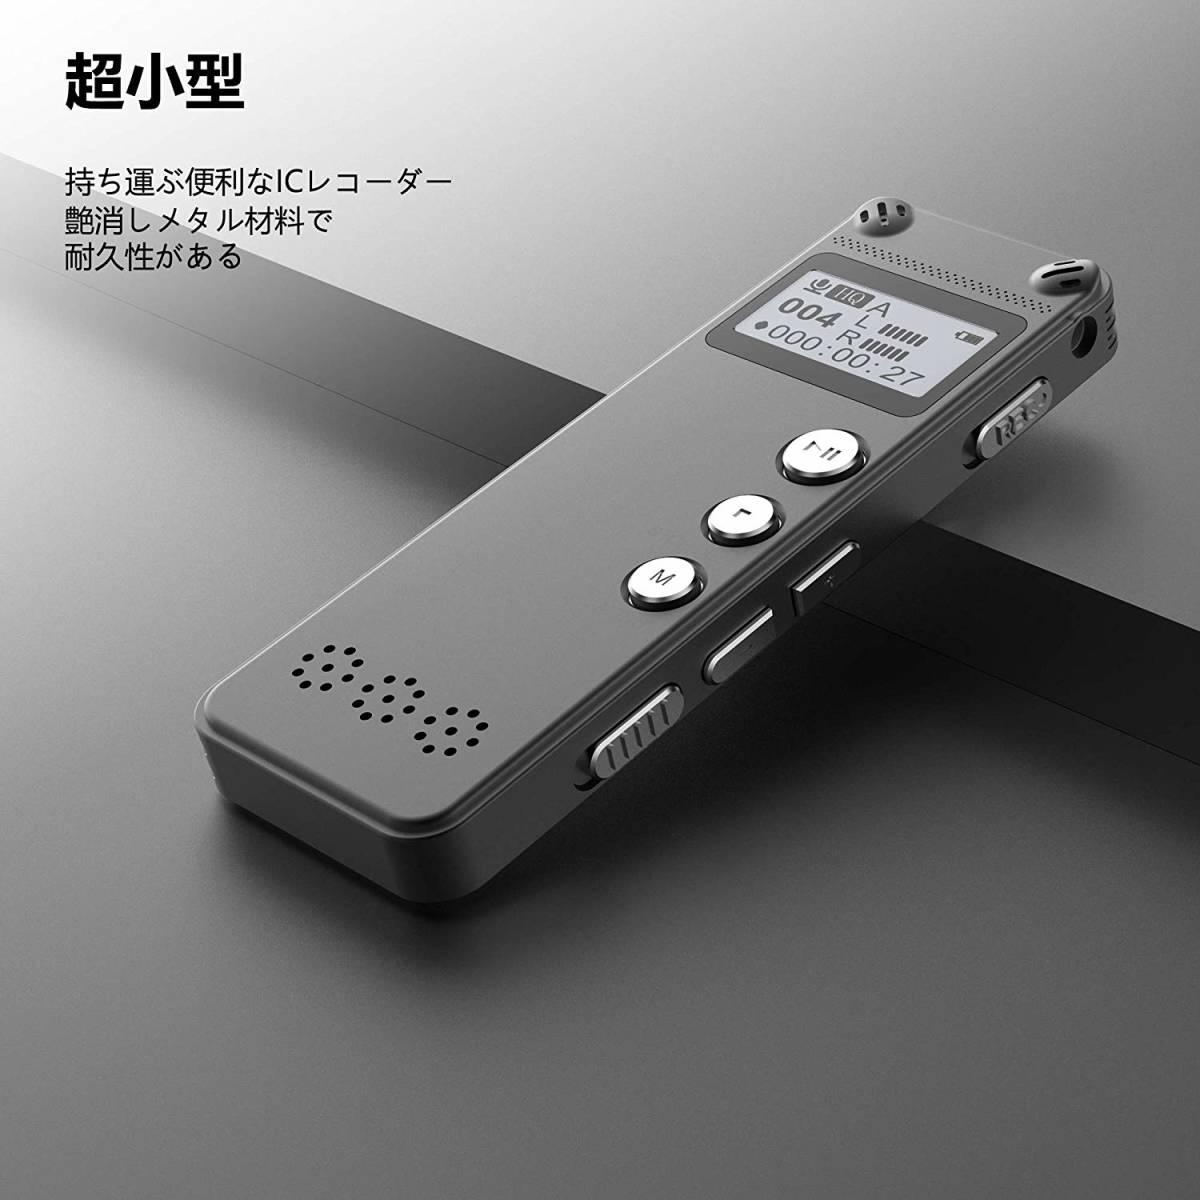 O991 新品 ボイスレコーダー ICレコーダー ノイズリダクション録音機 小型軽量MP3 高音質 大容量長時間録音 音声検出 定時録音_画像7